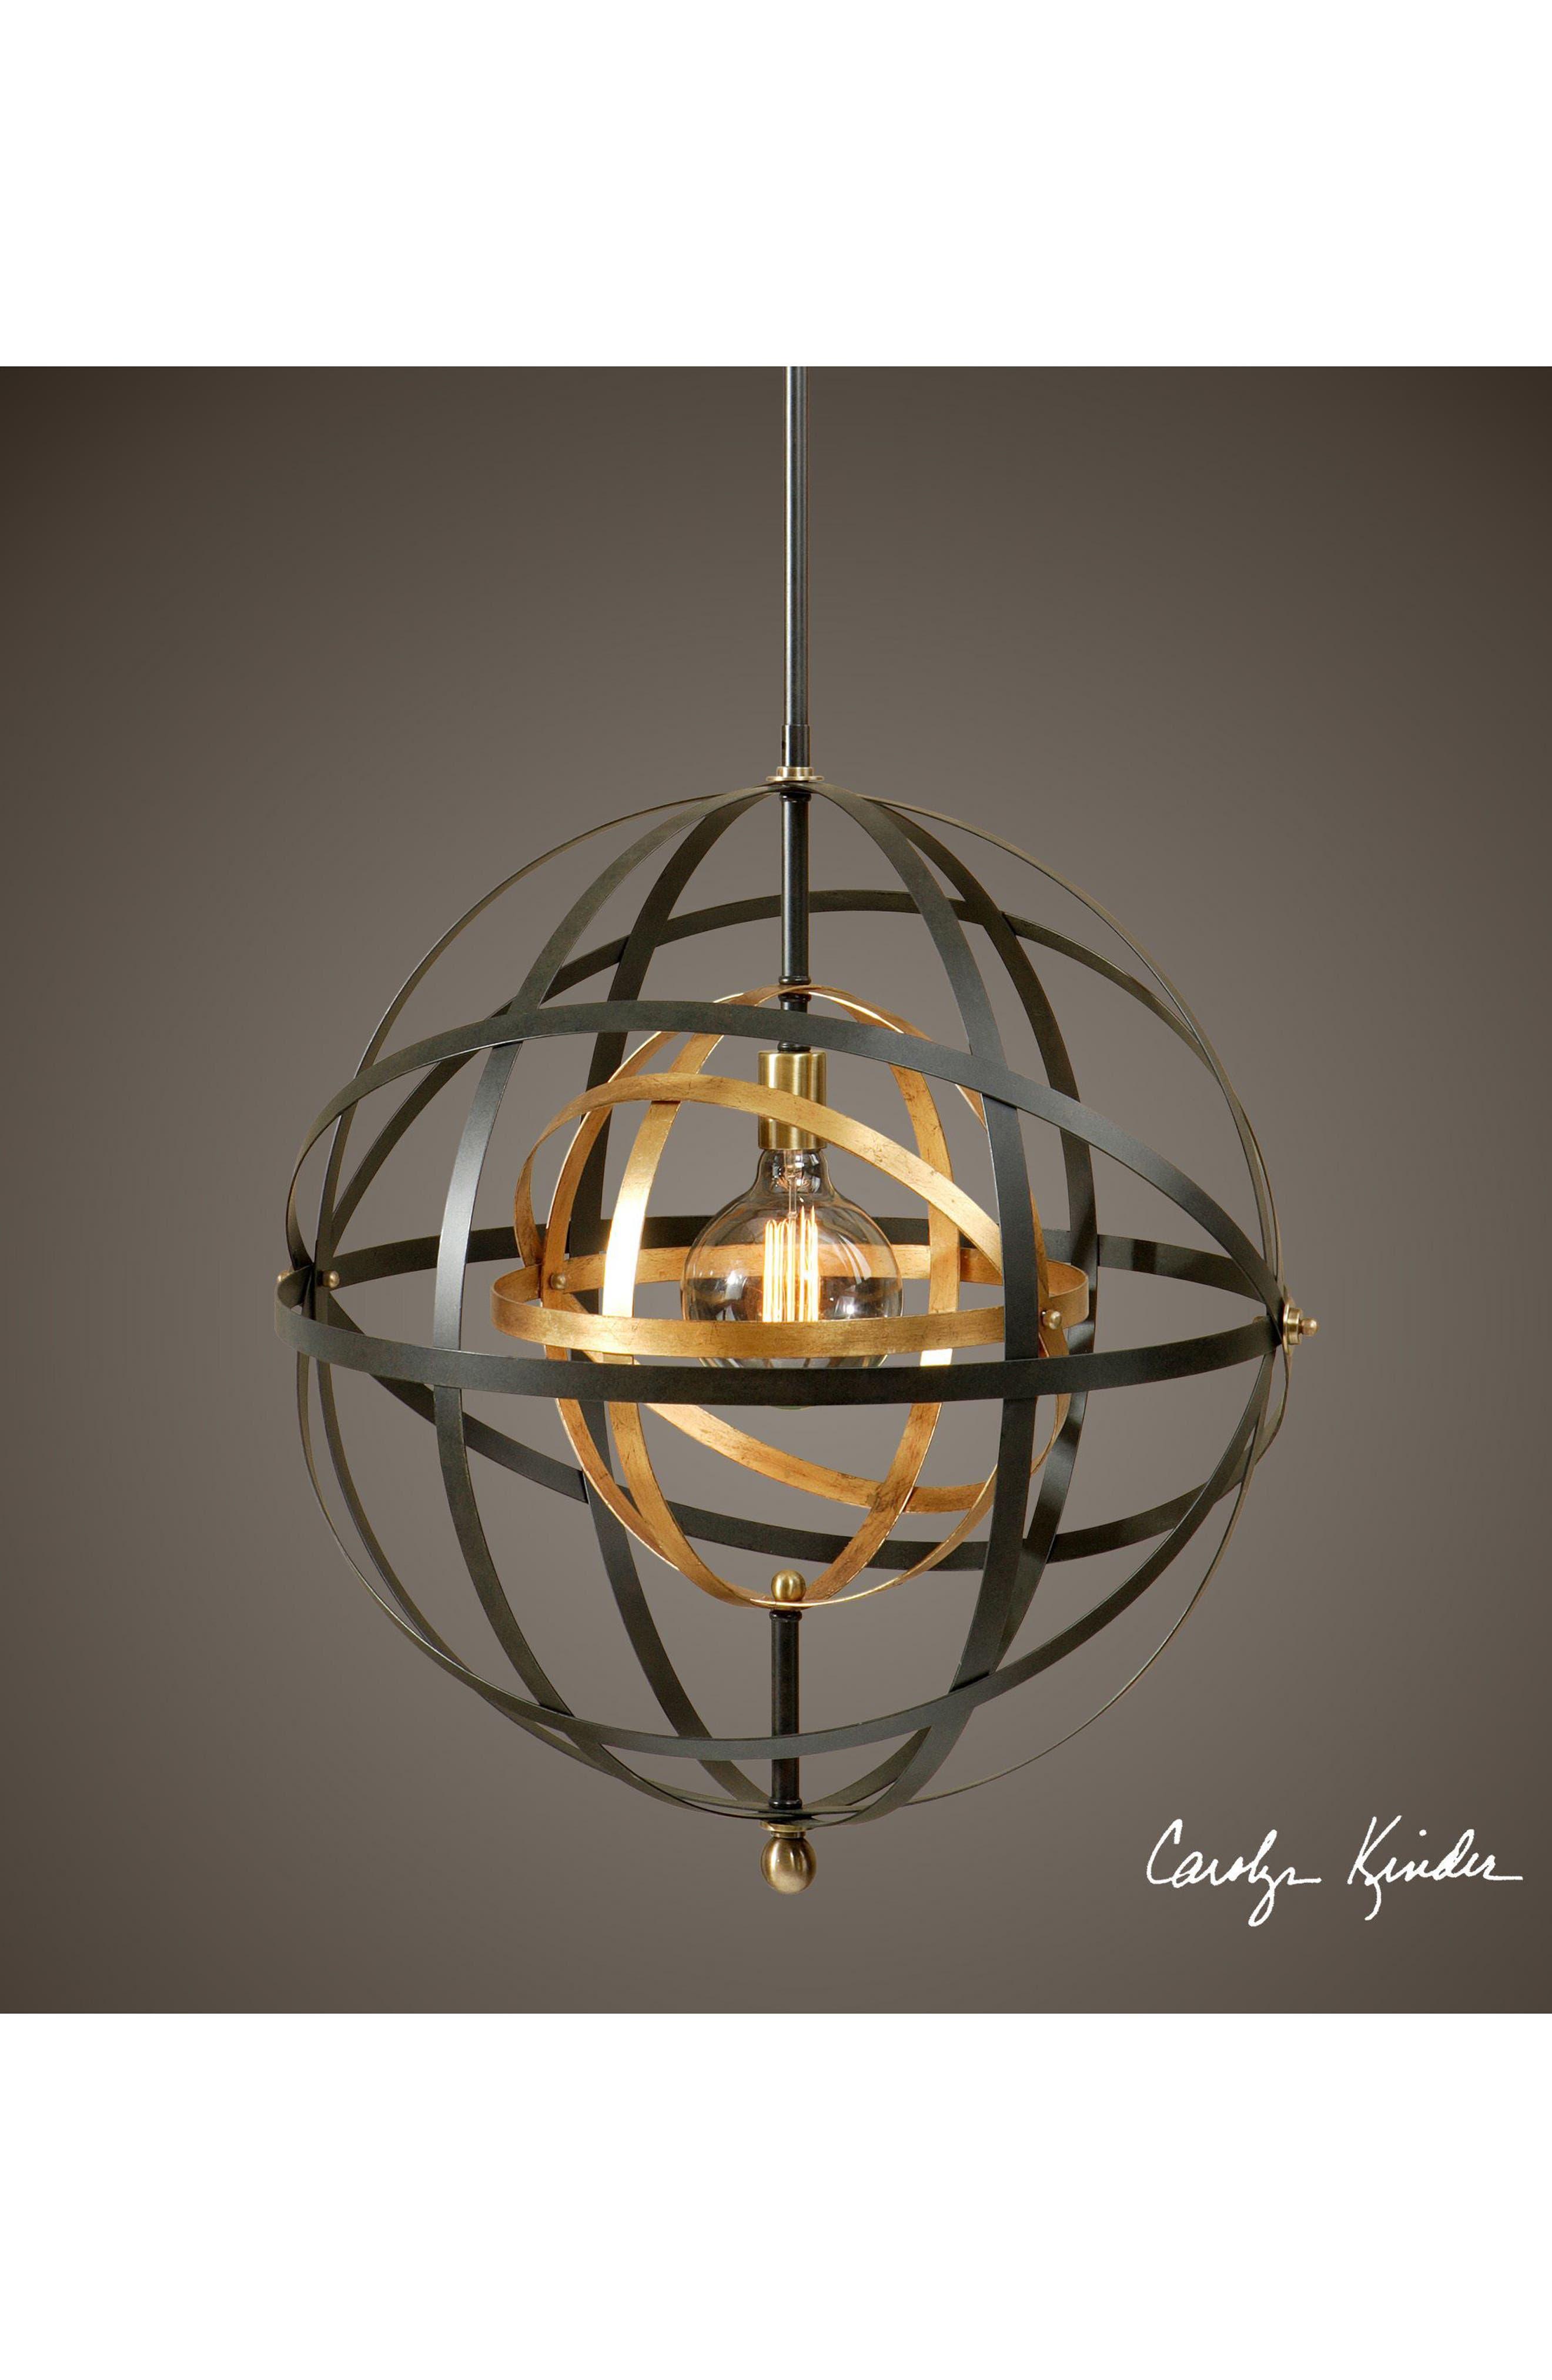 Rondure Pendant Light Fixture,                             Alternate thumbnail 2, color,                             Metallic Rust/ Copper